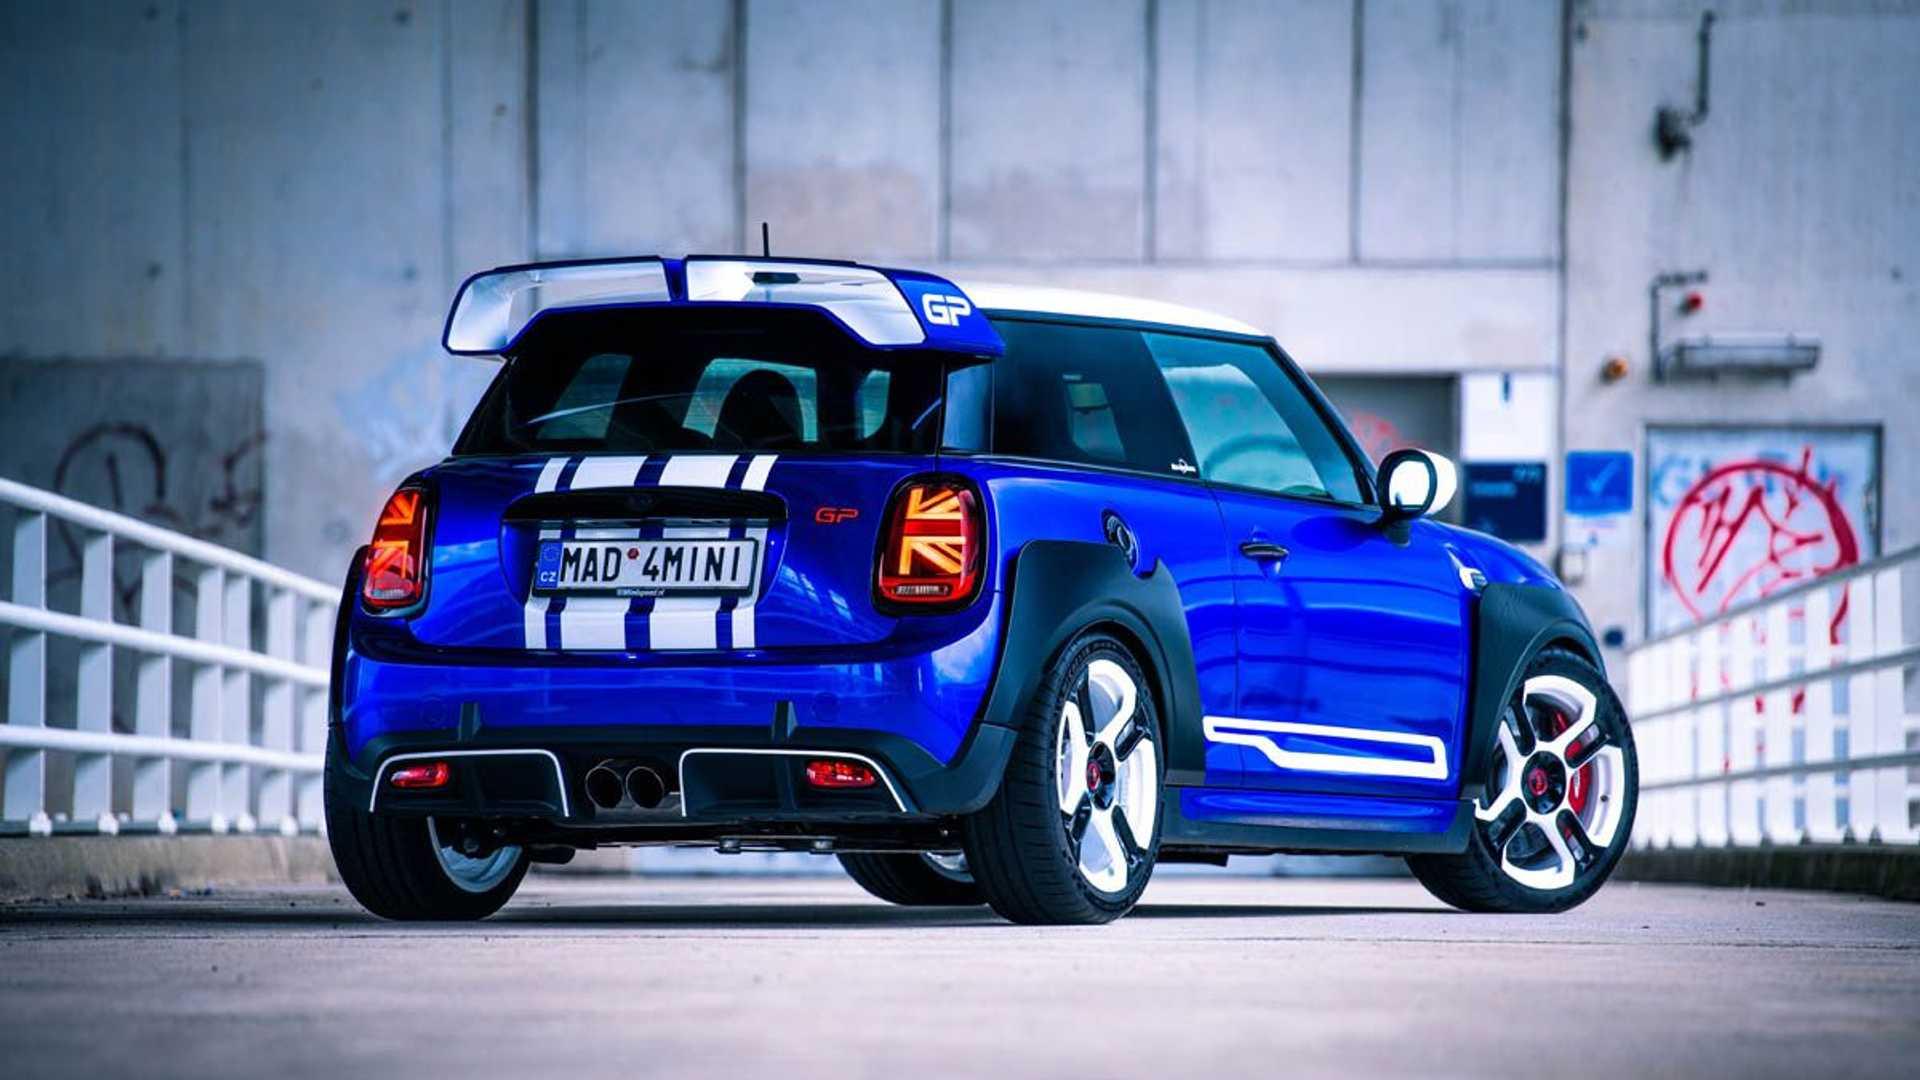 Mini-Cooper-John-Cooper-Works-GP-by-Beek-Auto-Racing-3